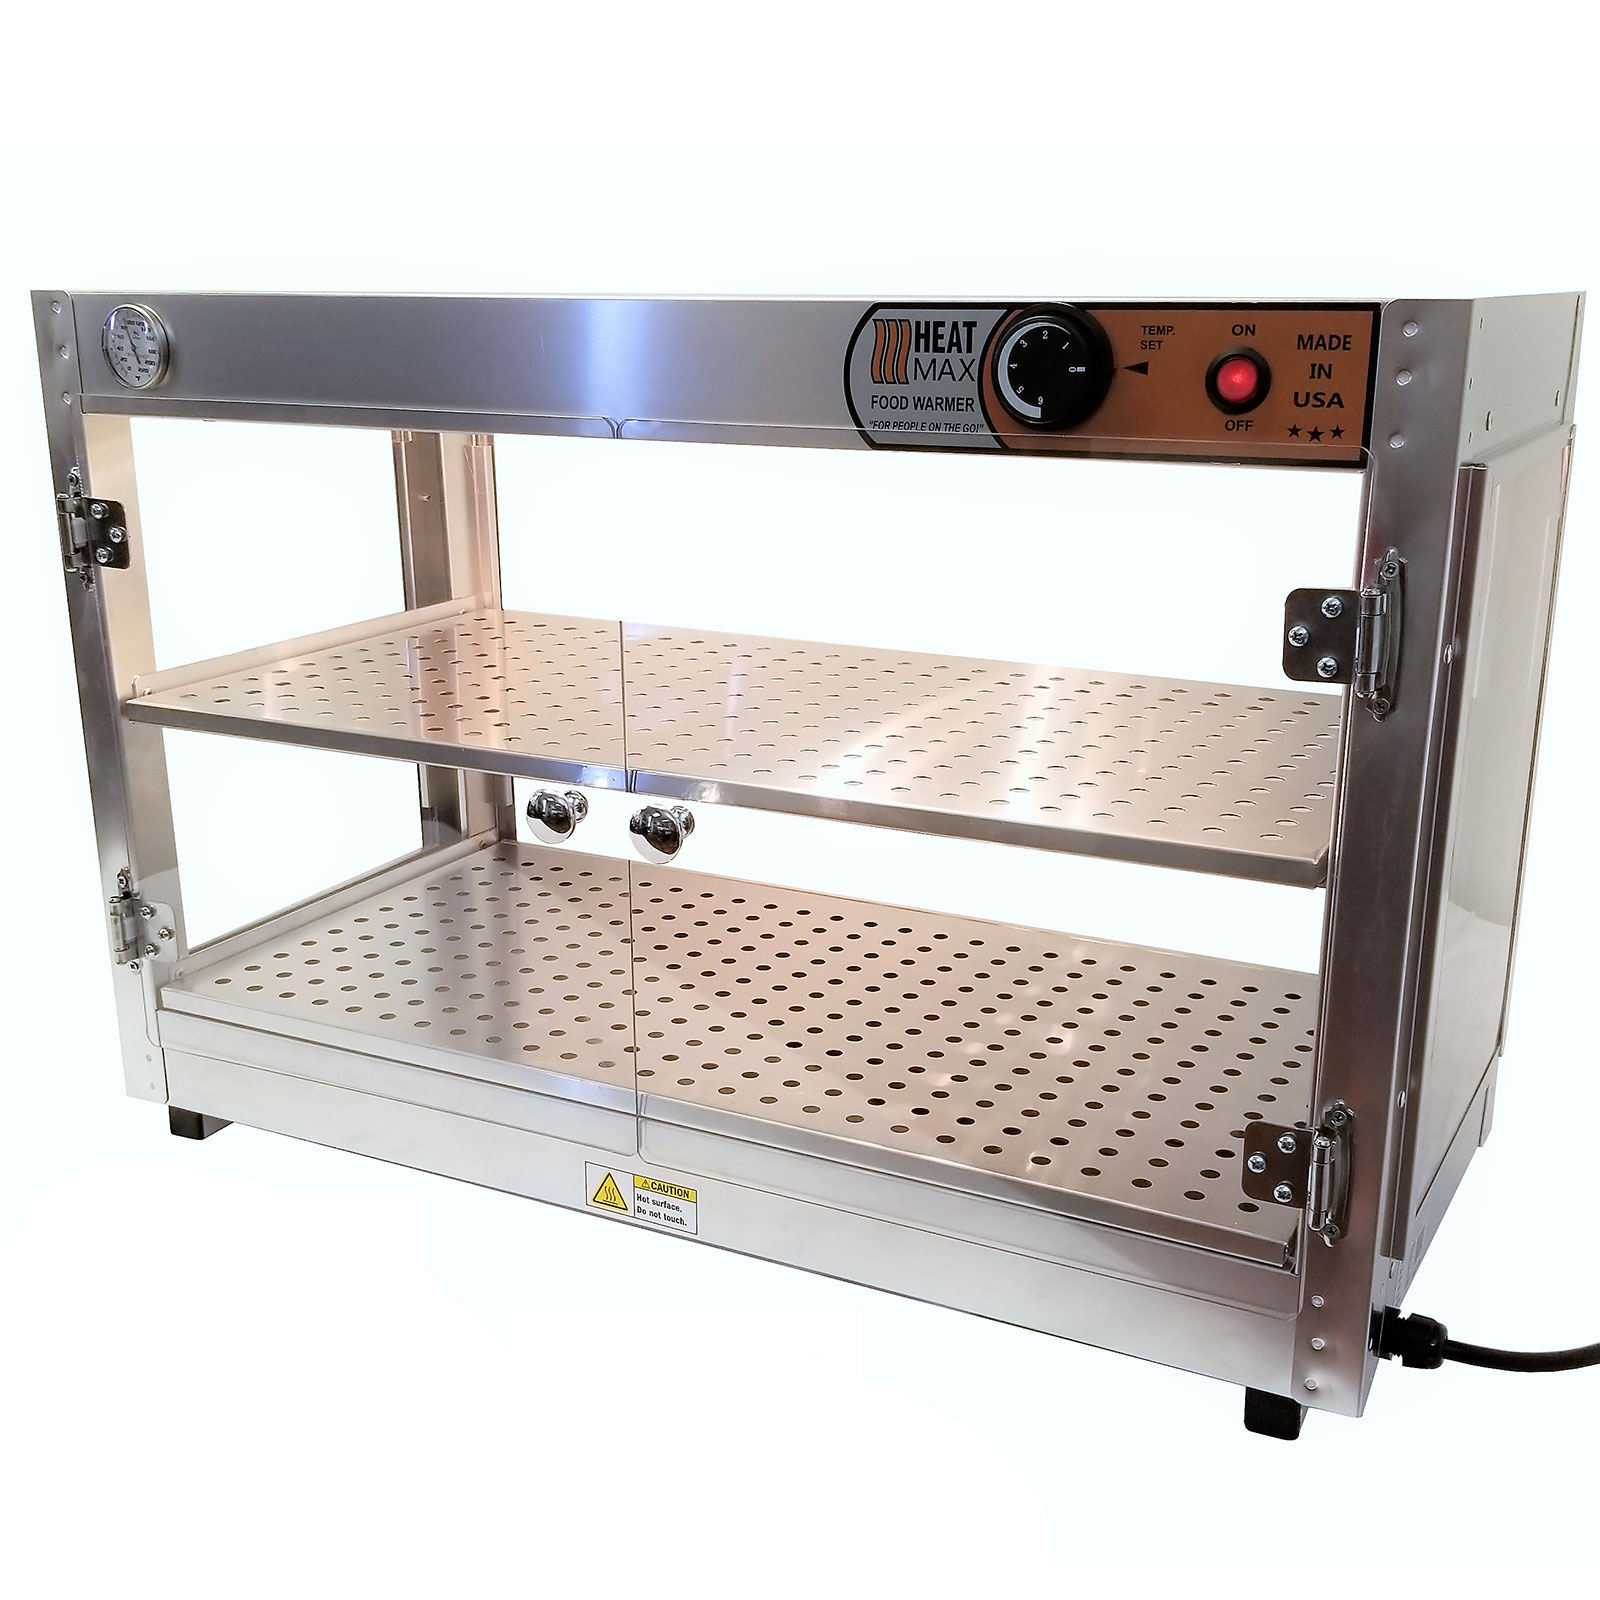 HeatMax Commercial 30 x 15 x 20 Countertop Food Pizza Pastry Warmer Wide Display